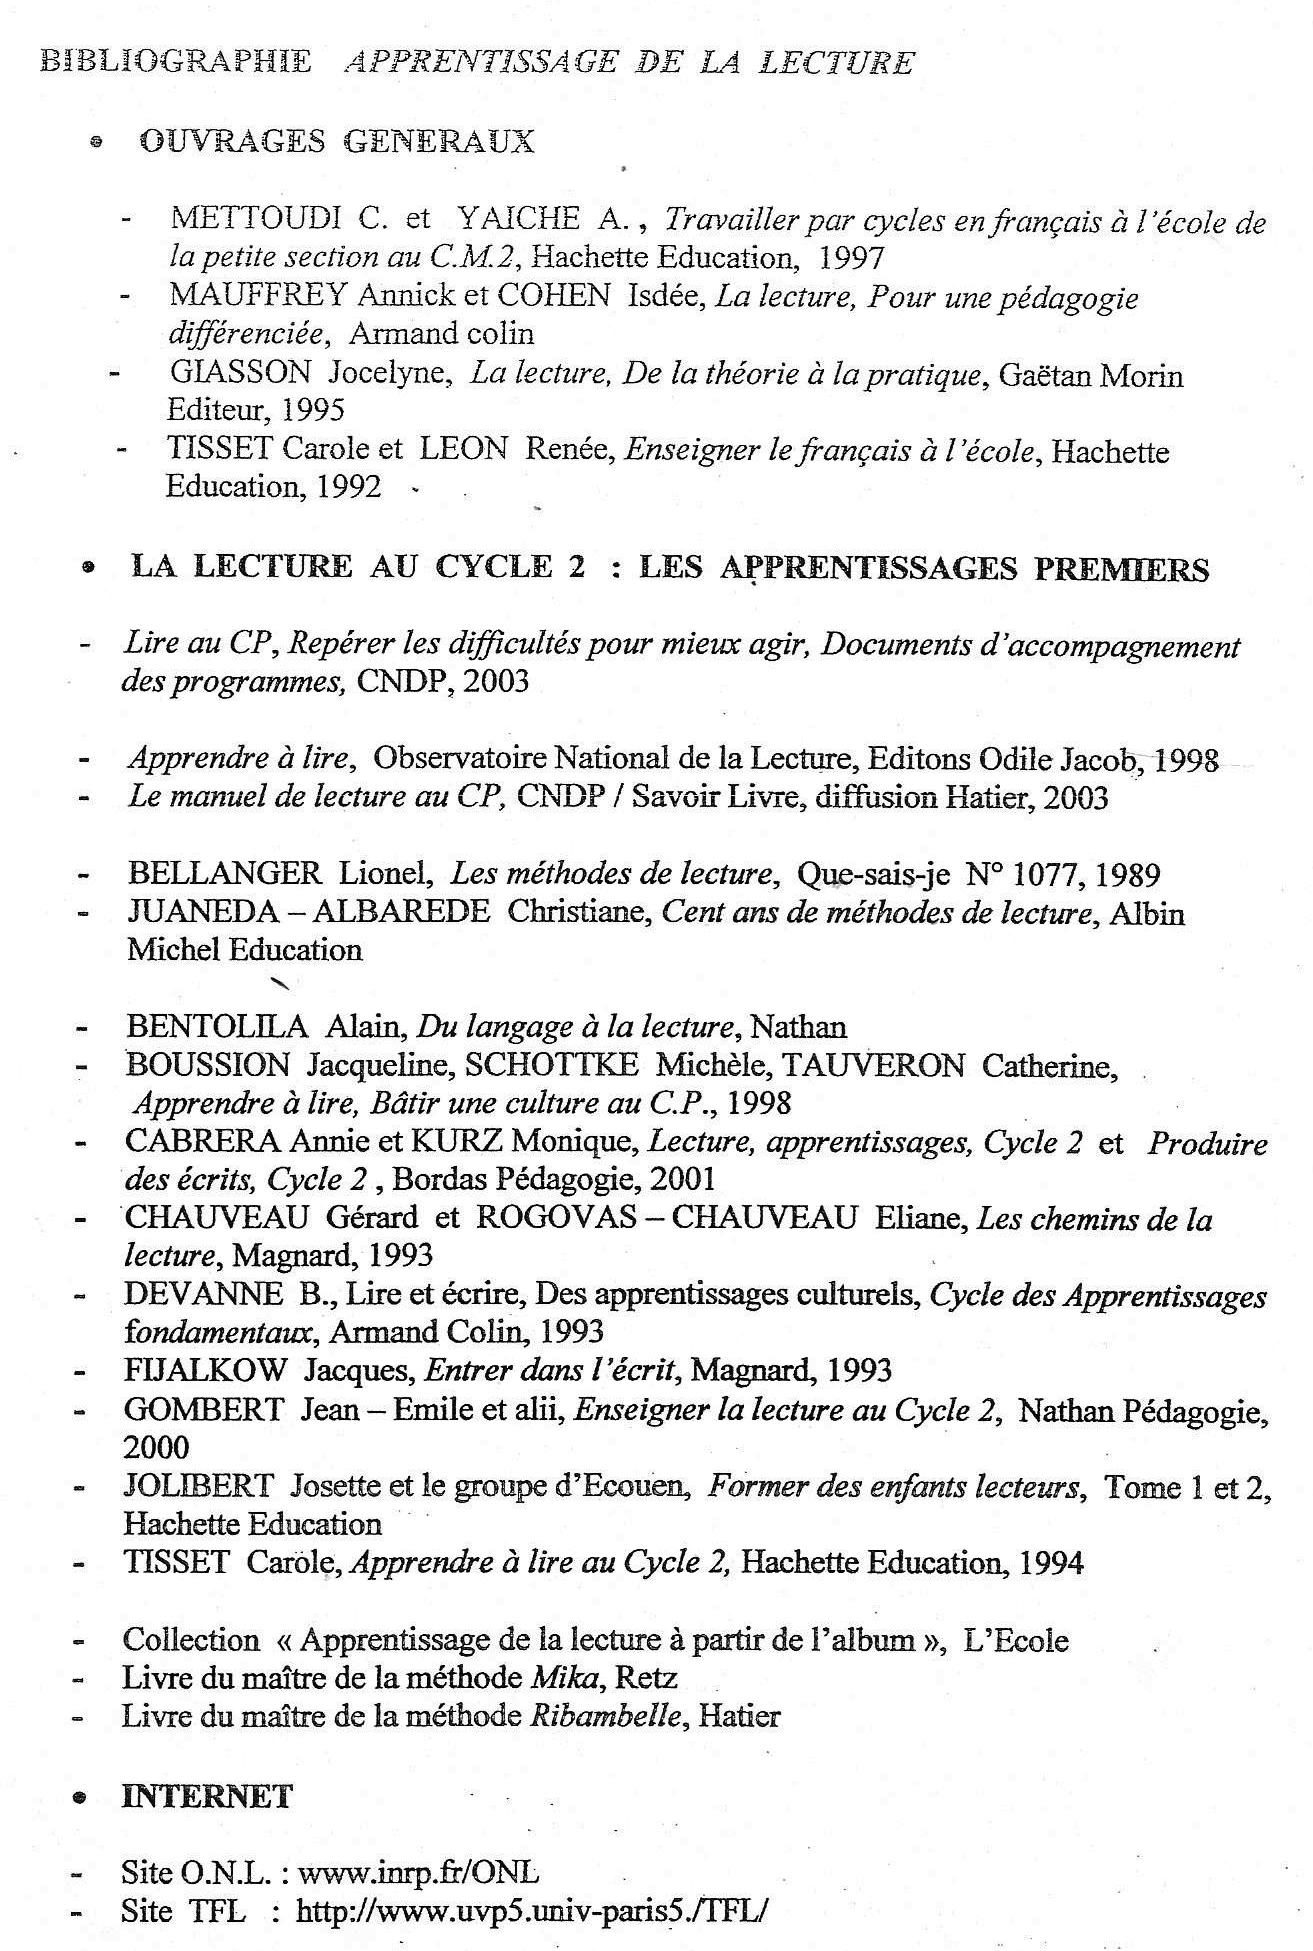 Bibliographie lecture IUFM 2005